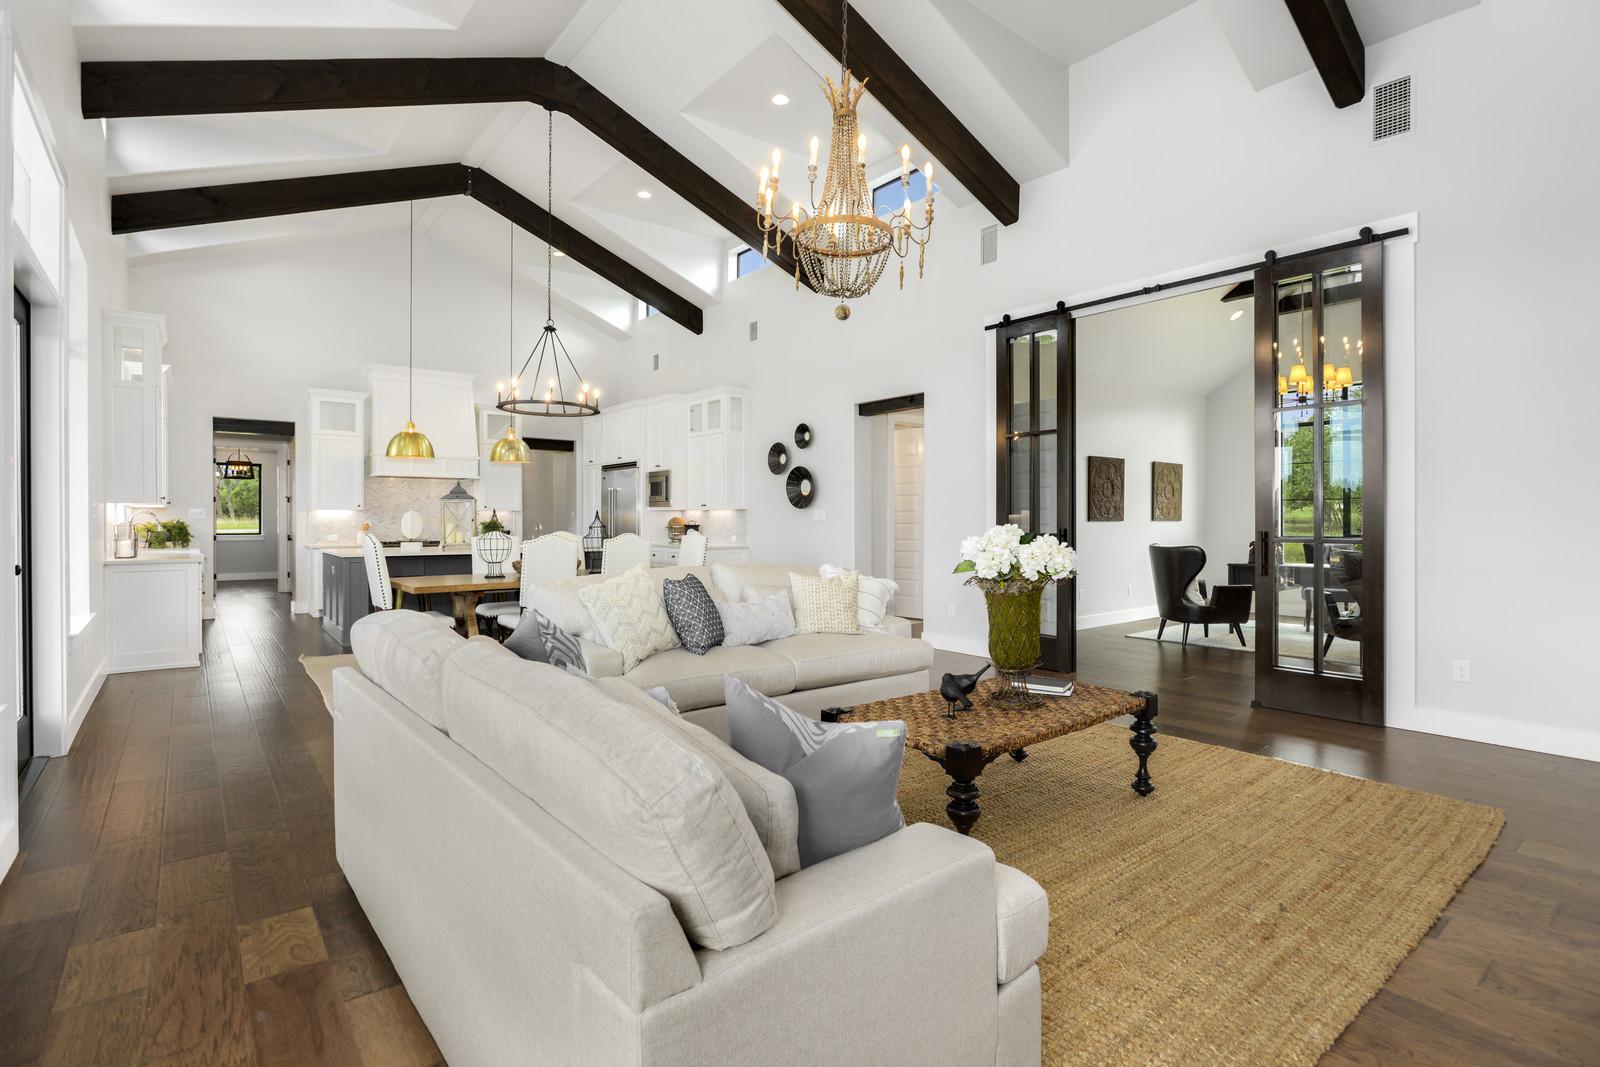 Boerne Custom Home - Modern Farmhouse Living Room Open to Kitchen